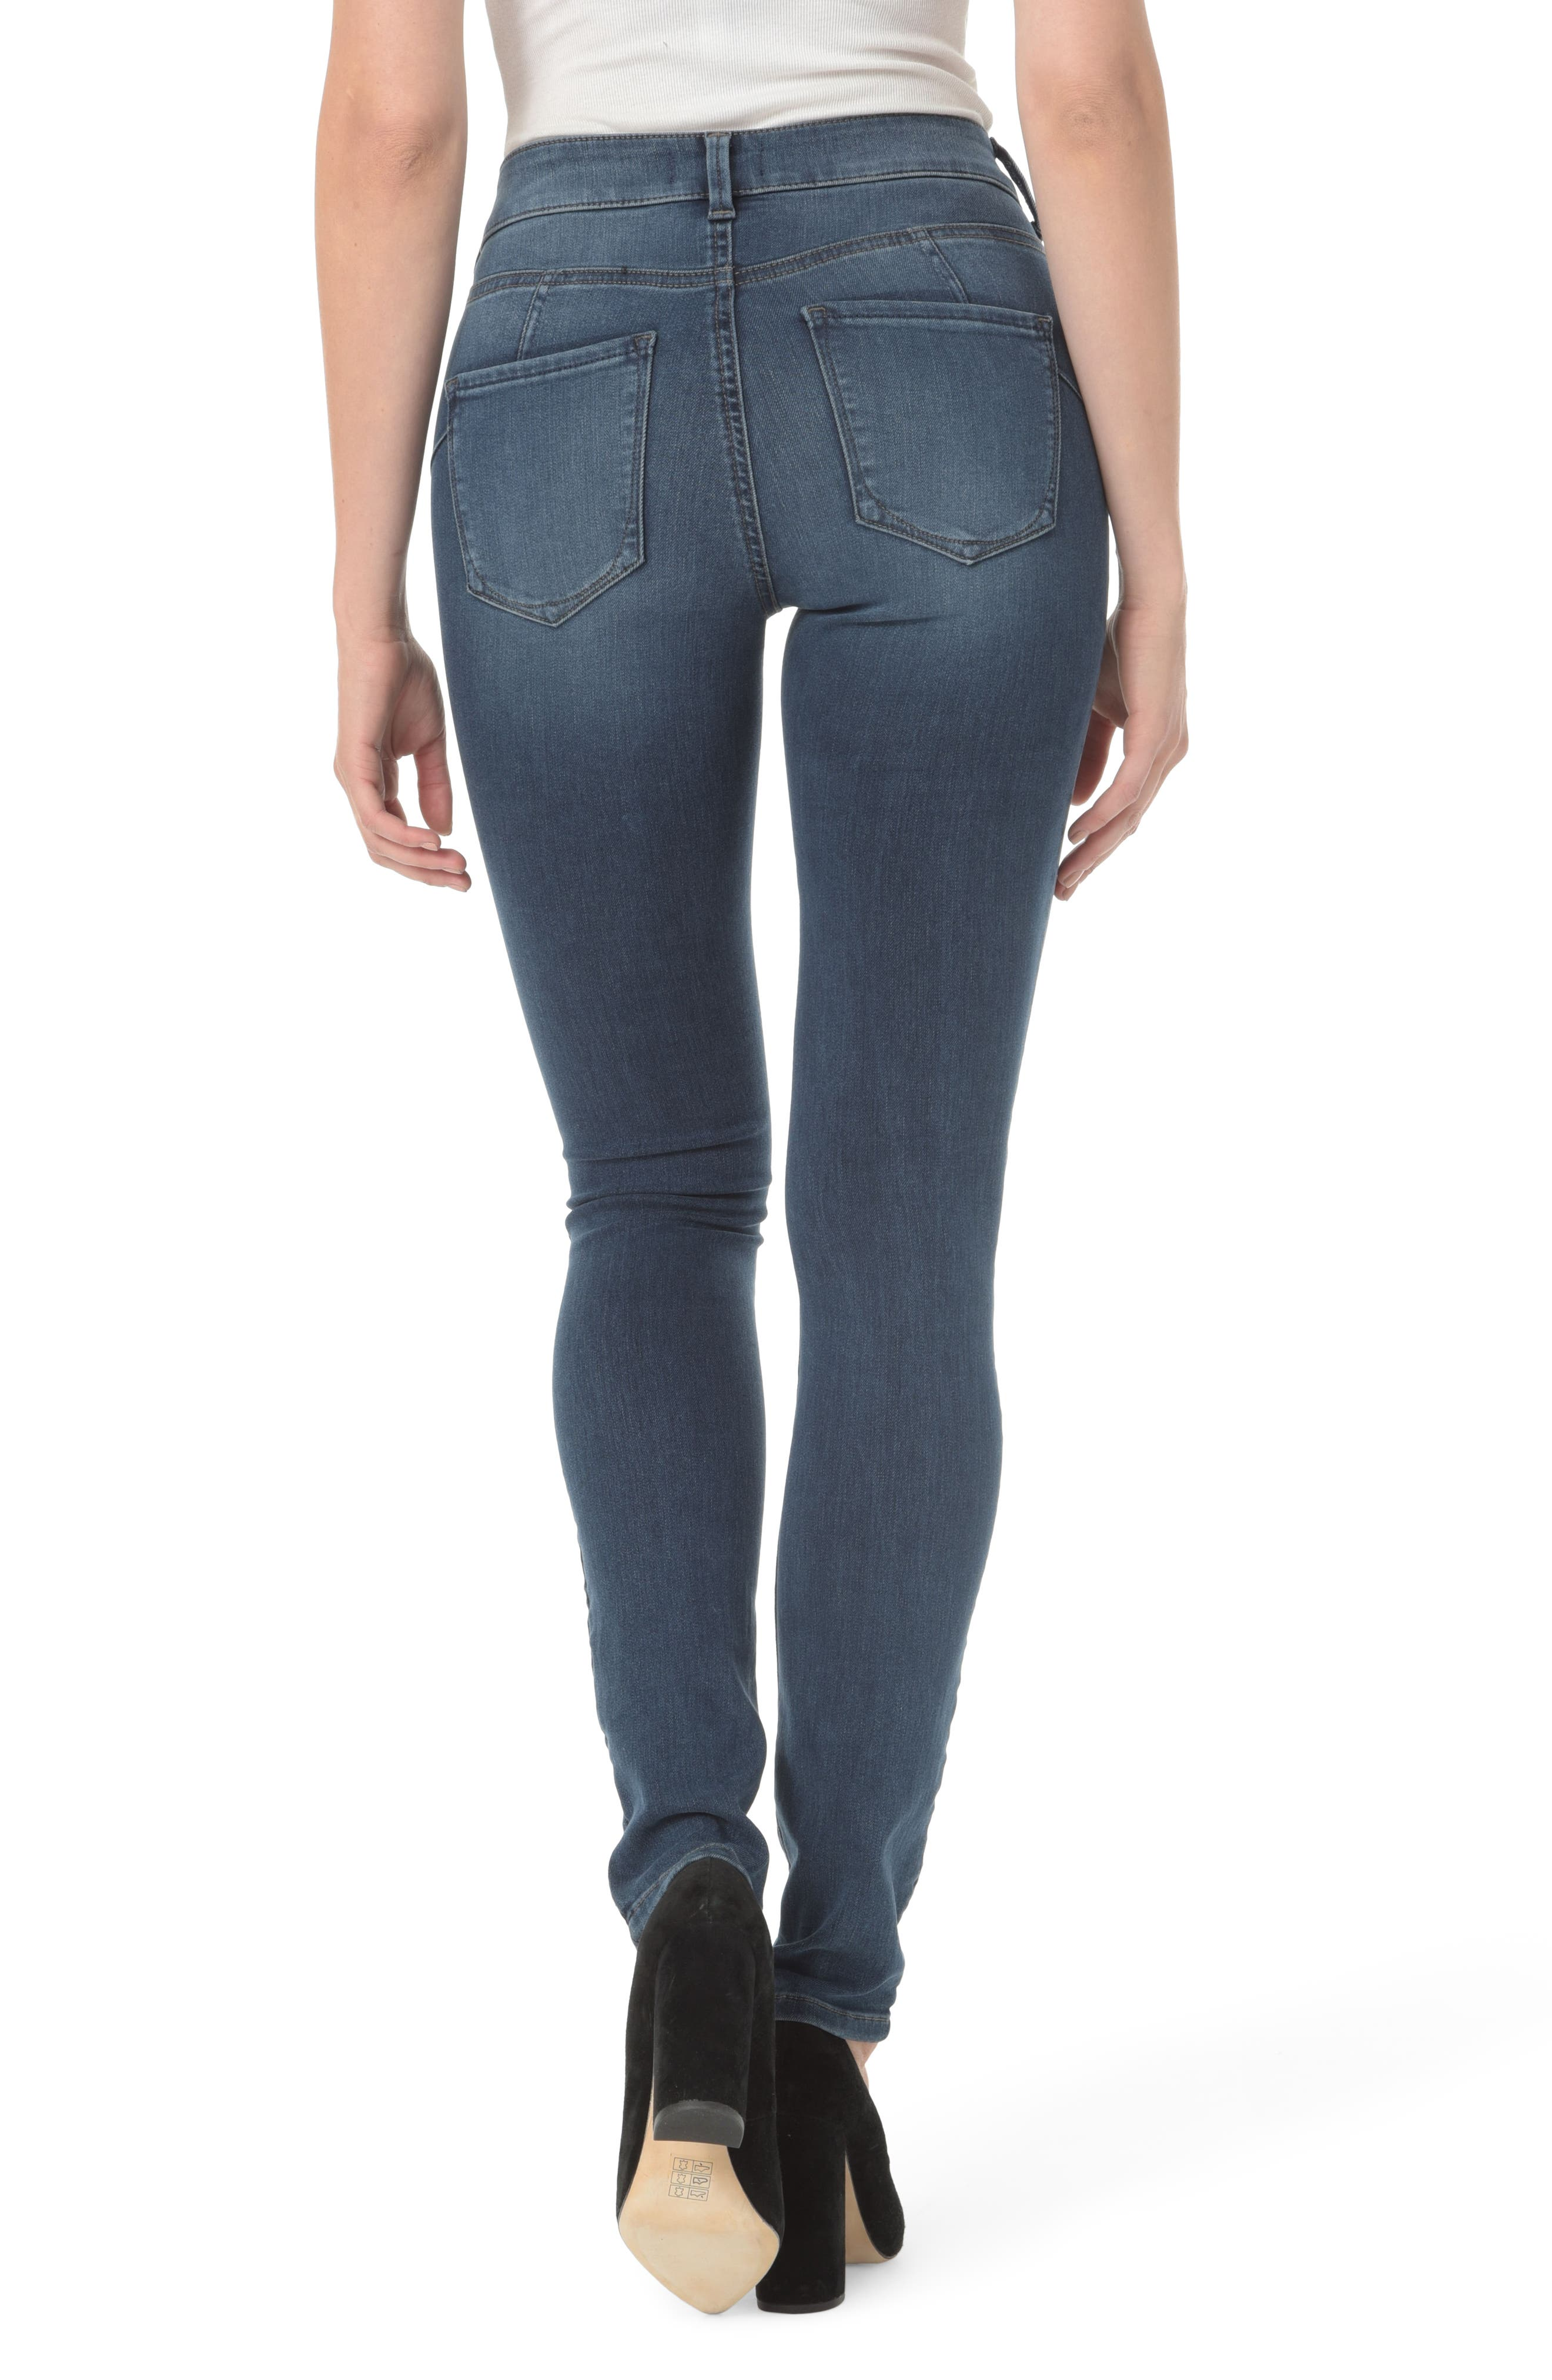 Alina Uplift Stretch Skinny Jeans,                             Alternate thumbnail 2, color,                             Traveler